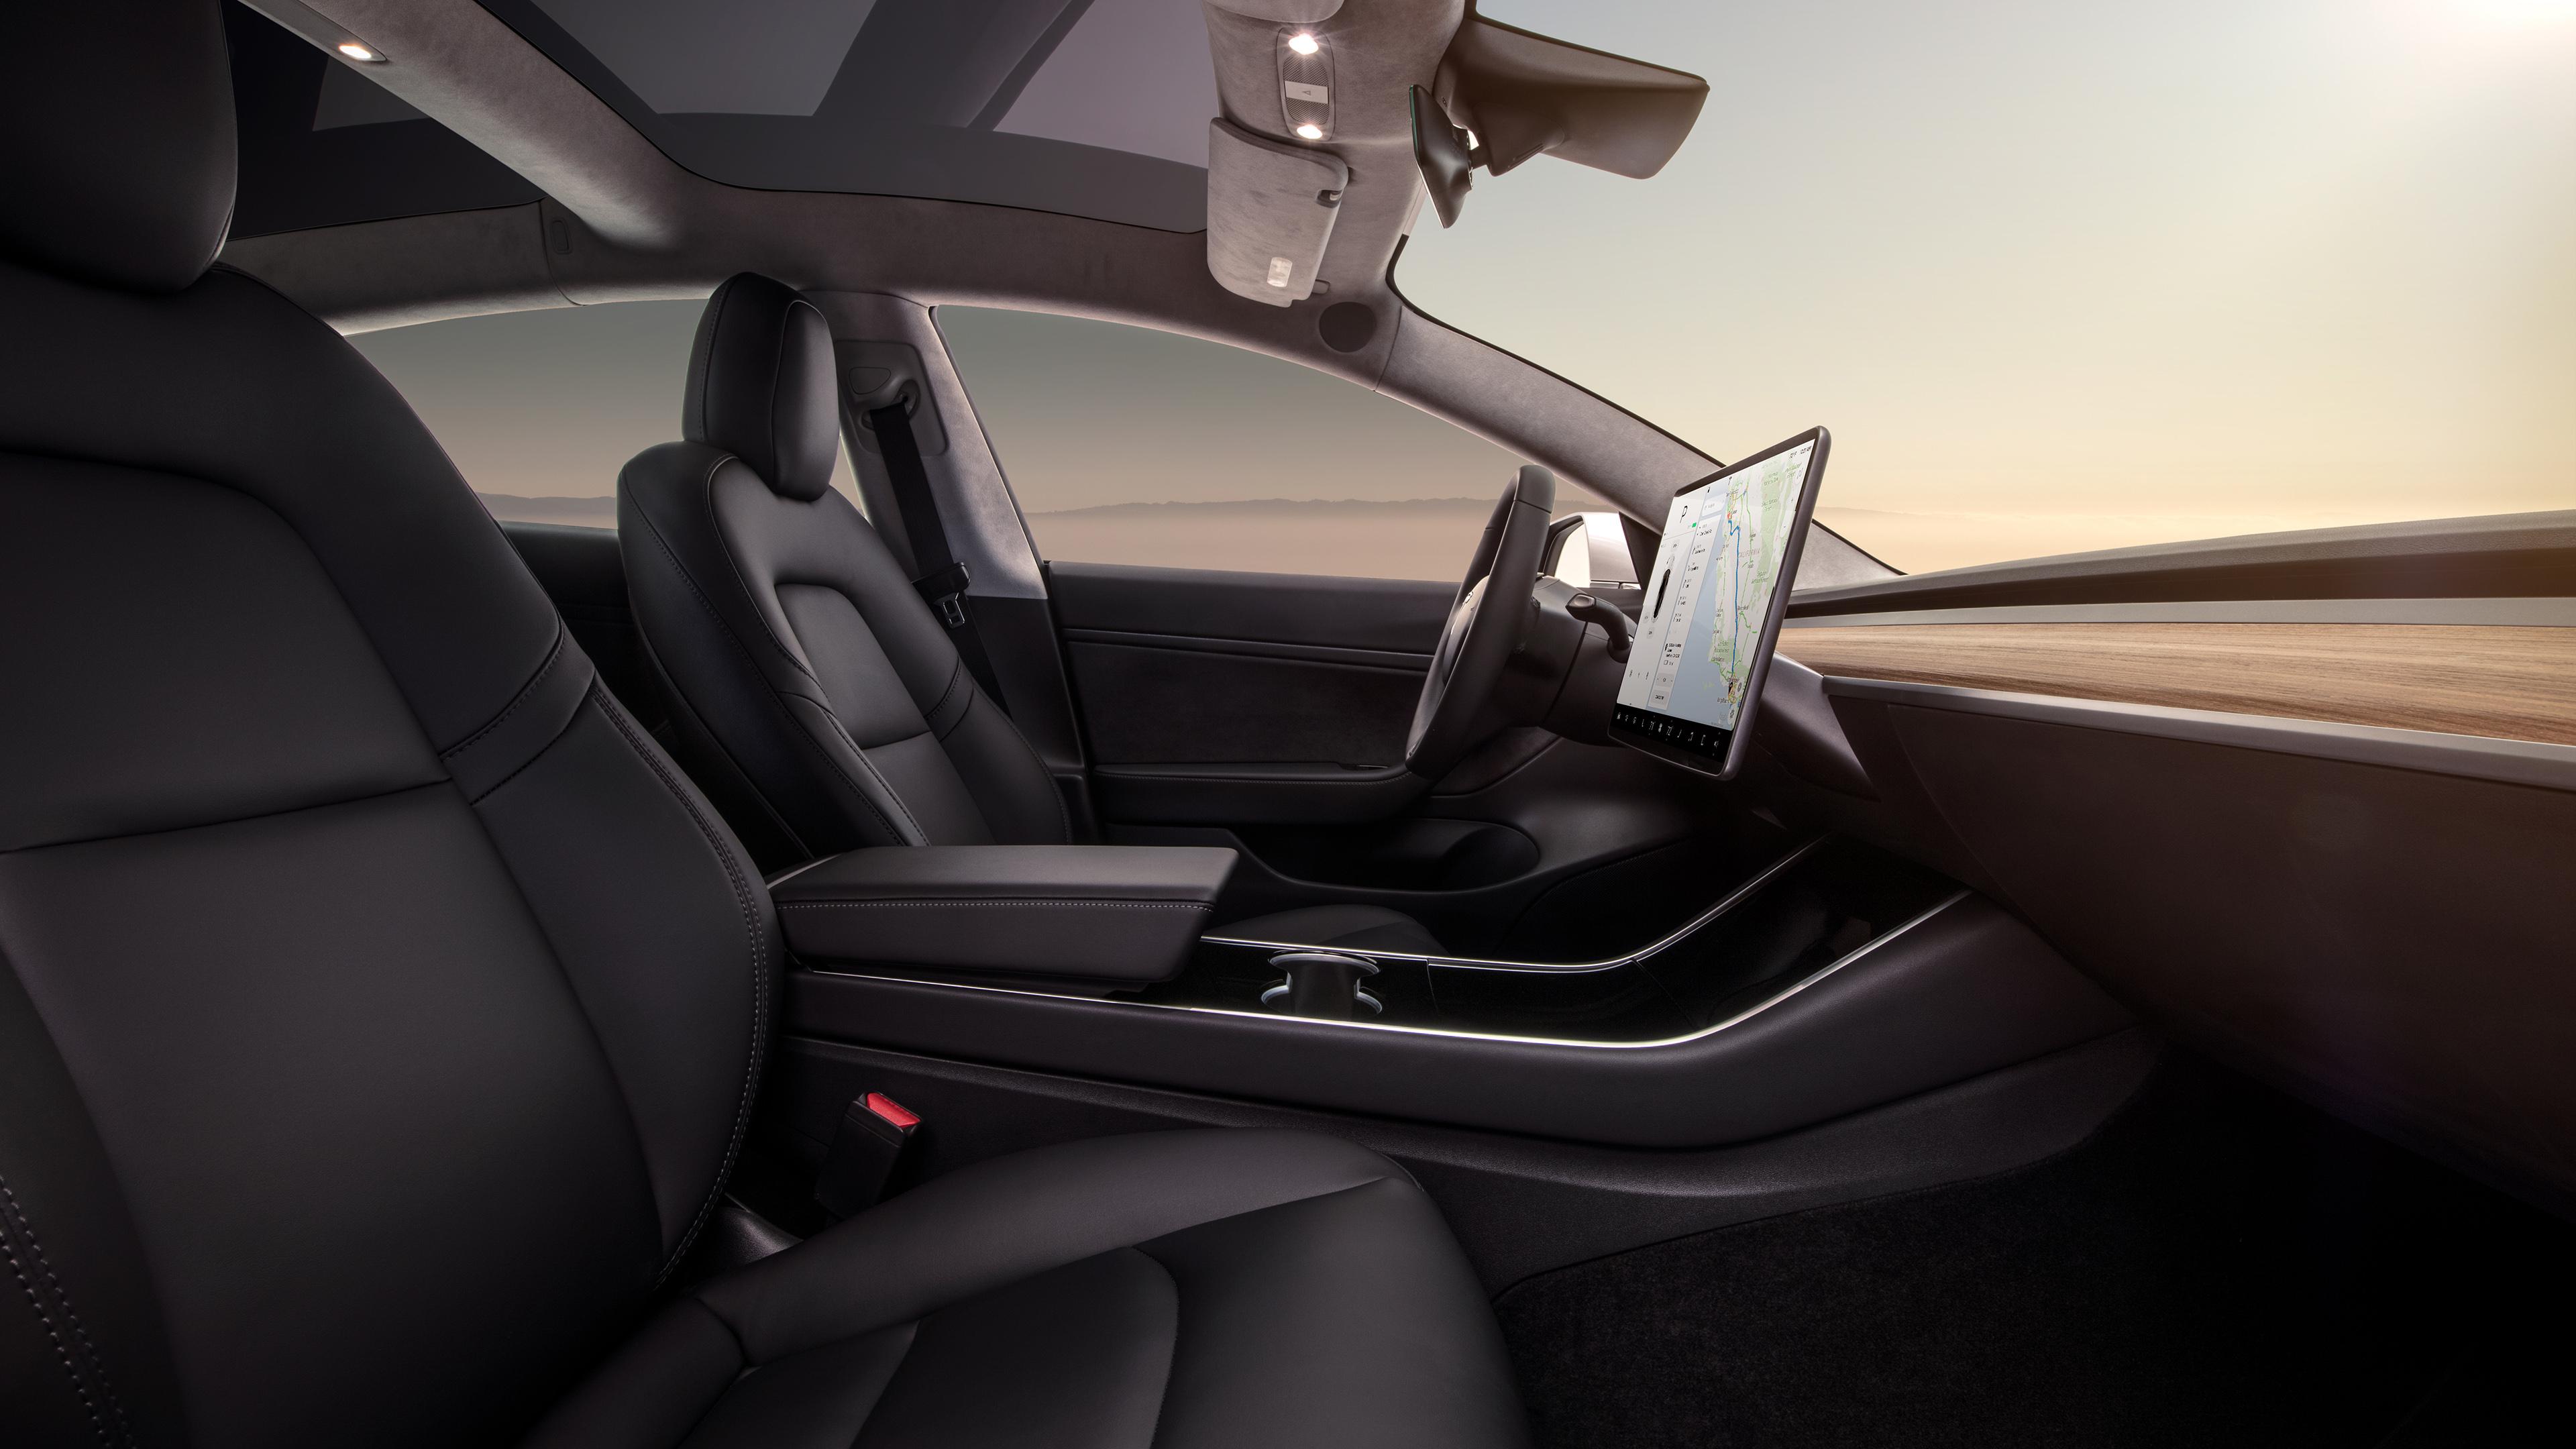 Tesla Model 3 interior front